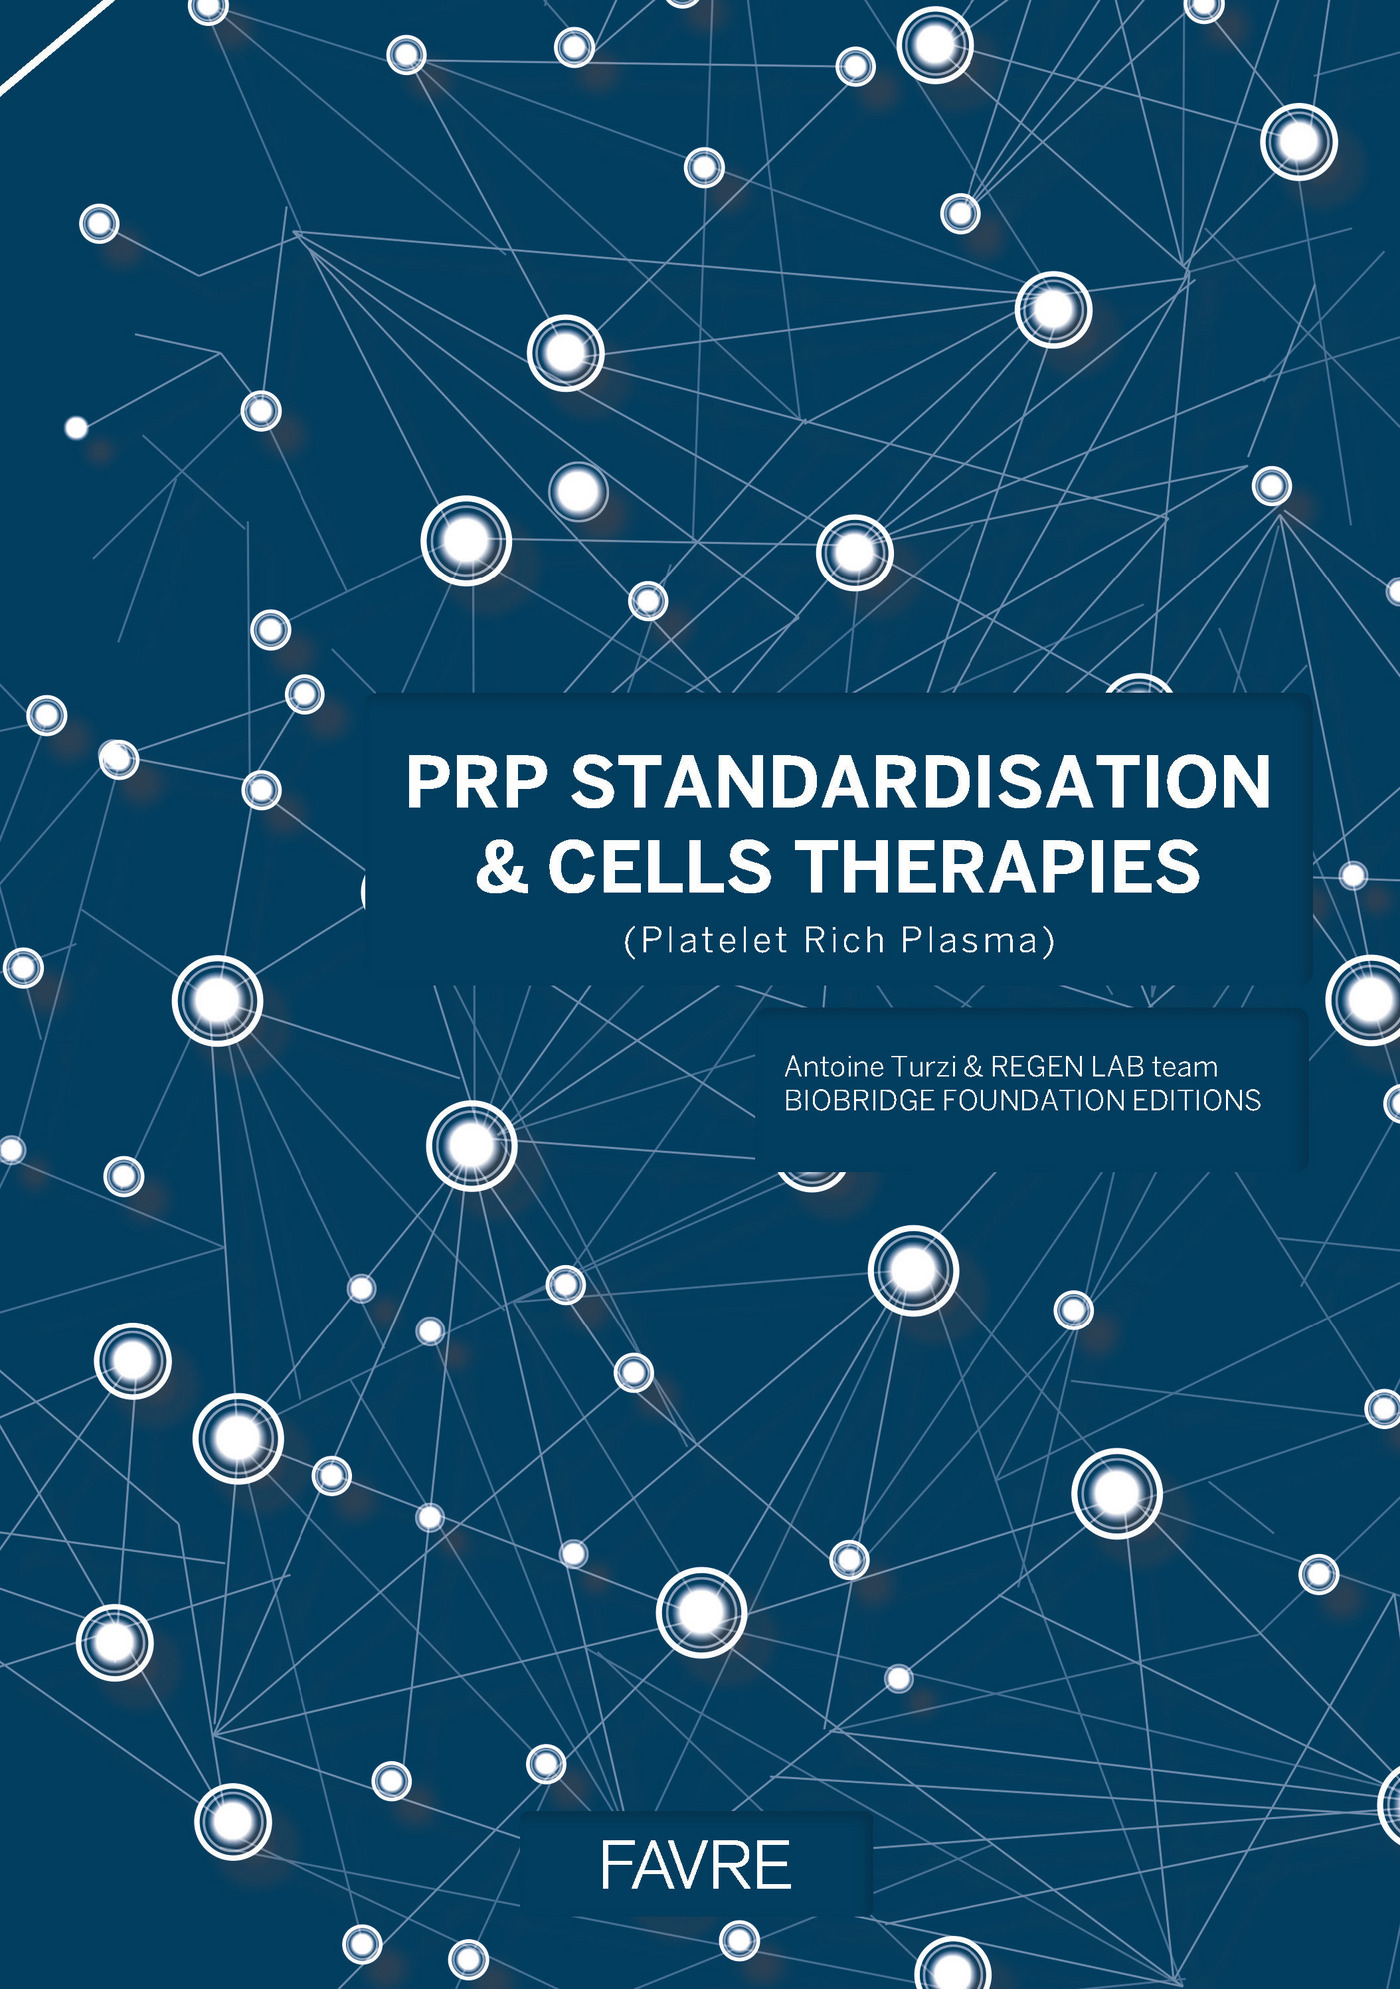 PRP standardisation & cells therapies